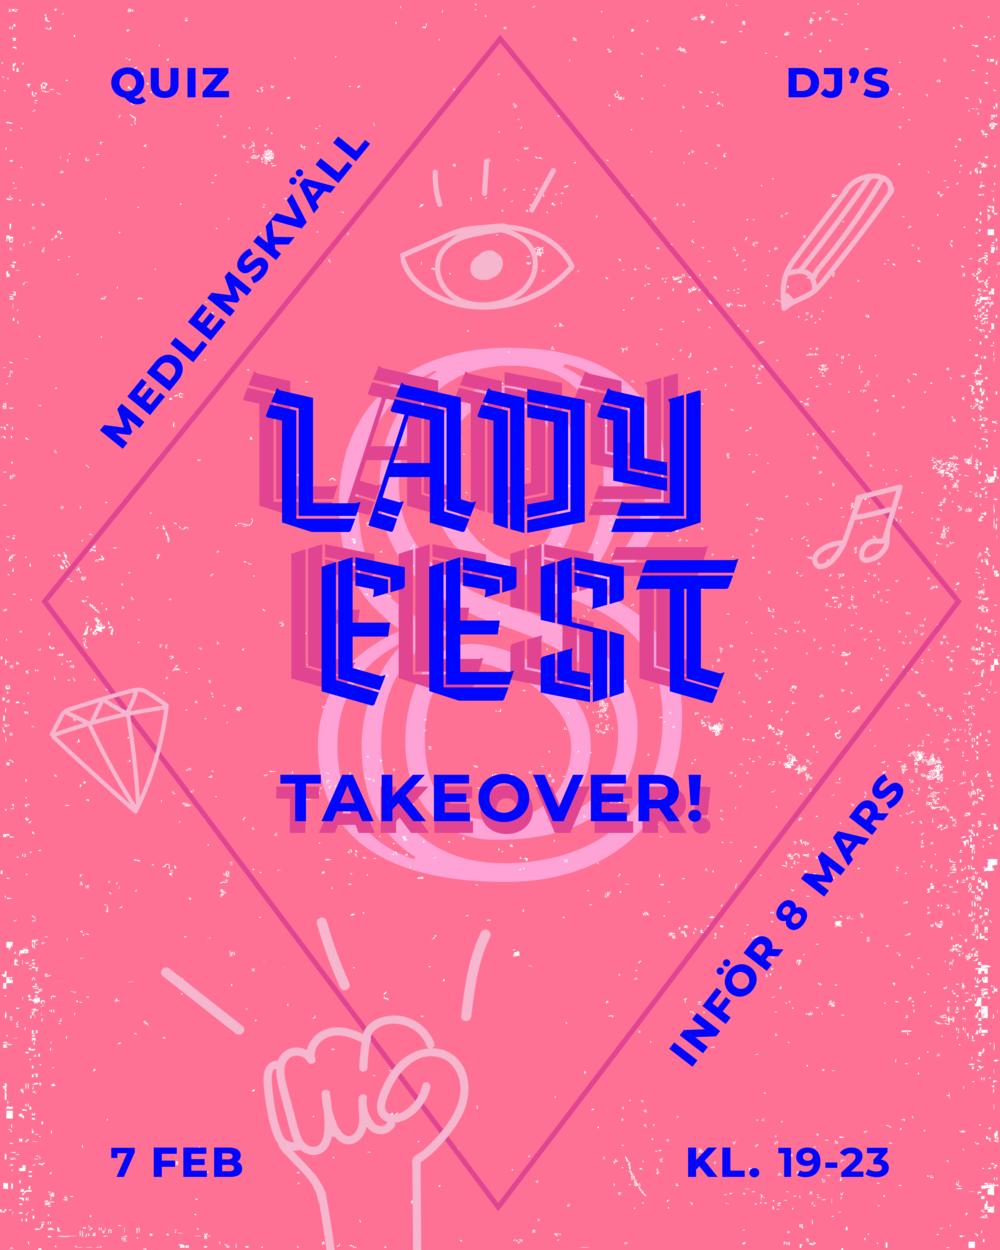 ladyfest_takeover_ig.png